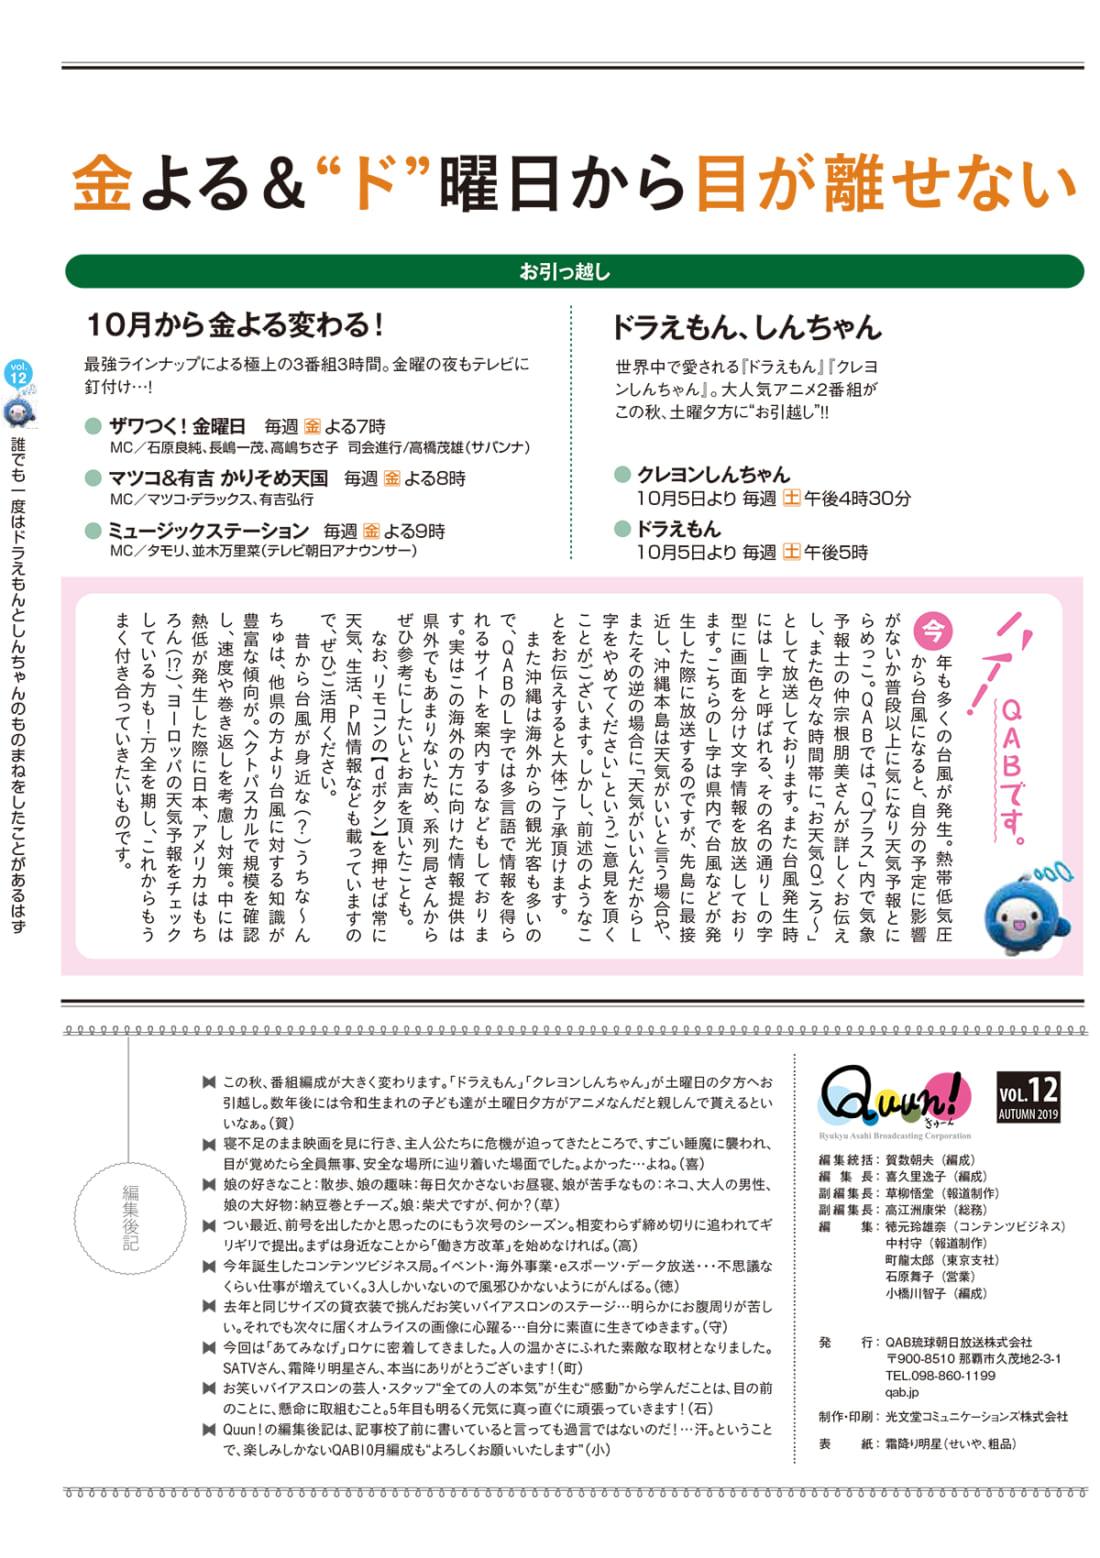 https://www.qab.co.jp/qgoro/wp-content/uploads/quun_1215-1100x1558.jpg